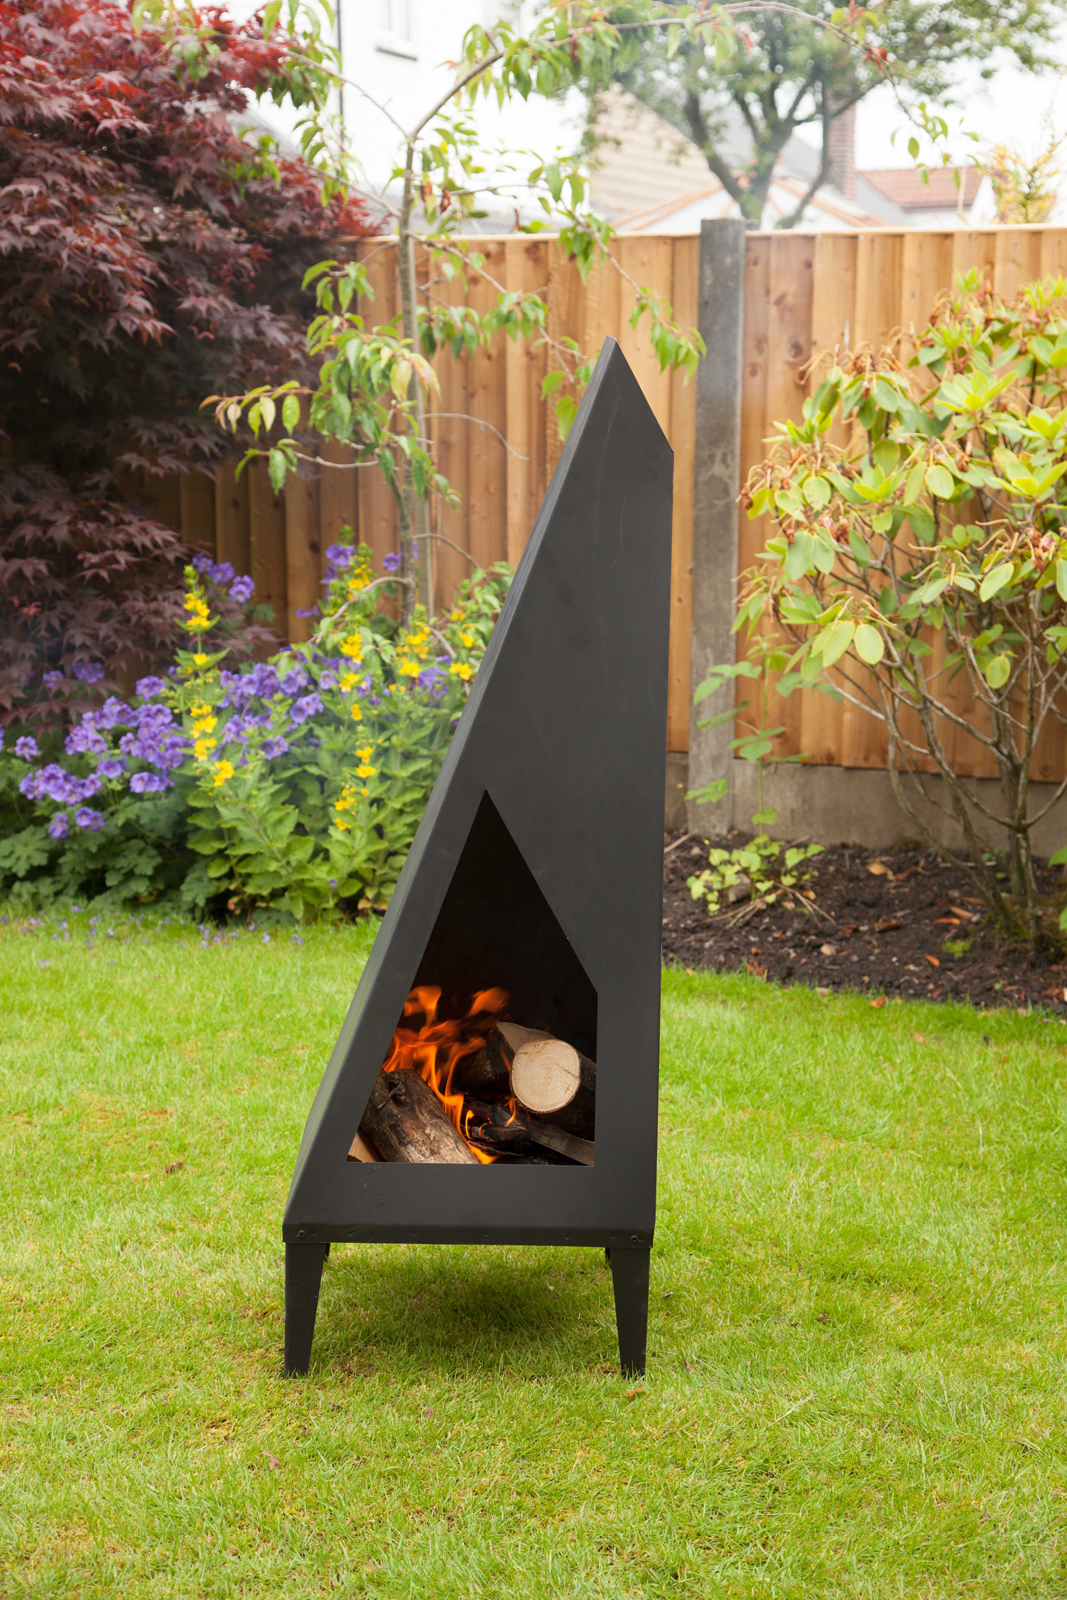 Made Ou0027 Metal Steel Modern Art Garden Patio Chiminea Chimney Burner 1.3m  Heater